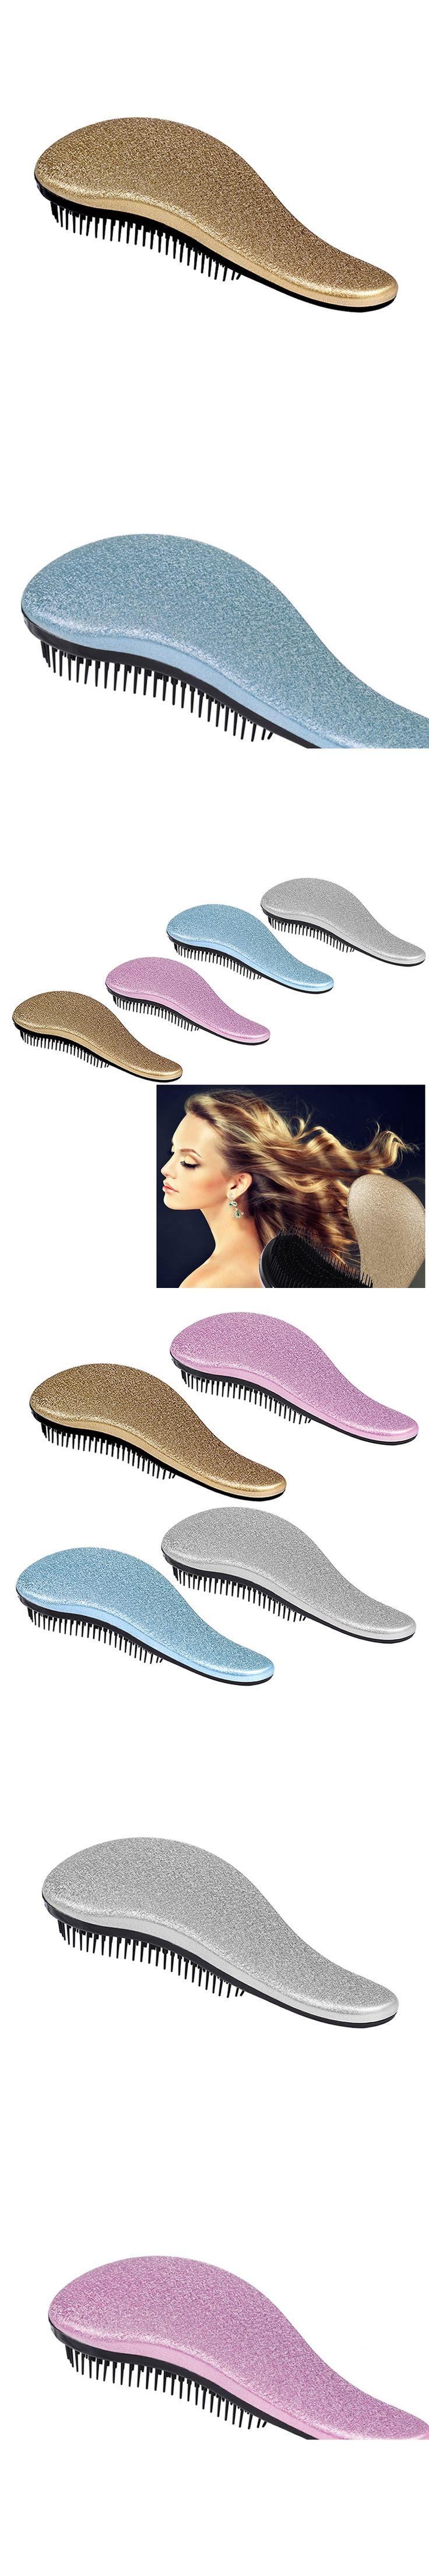 Magic Hairbrush for Comb Professional Hair Shower Brush hair brush straightener